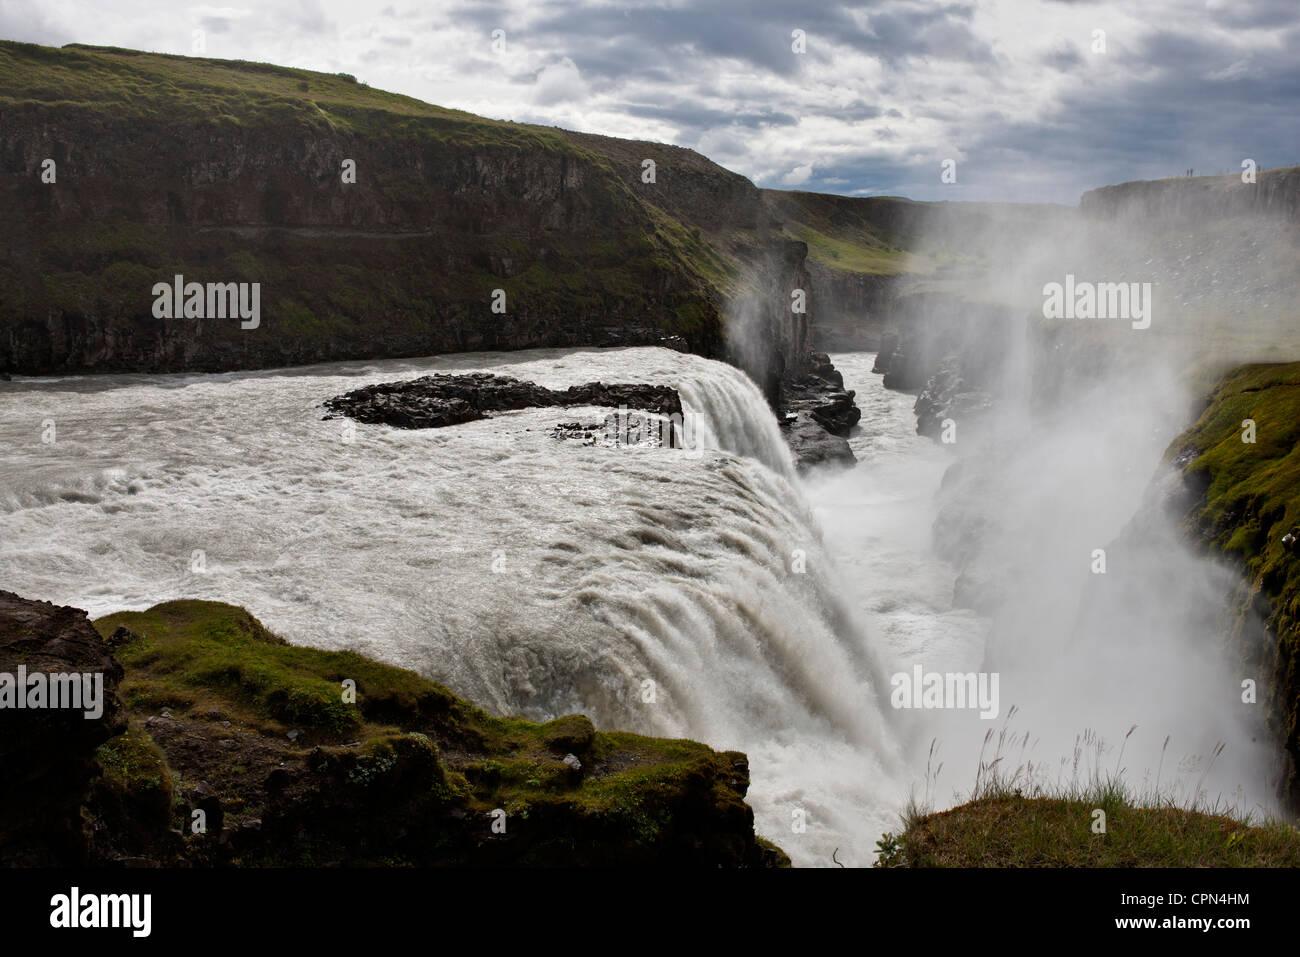 Gullfoss waterfall, Iceland - Stock Image